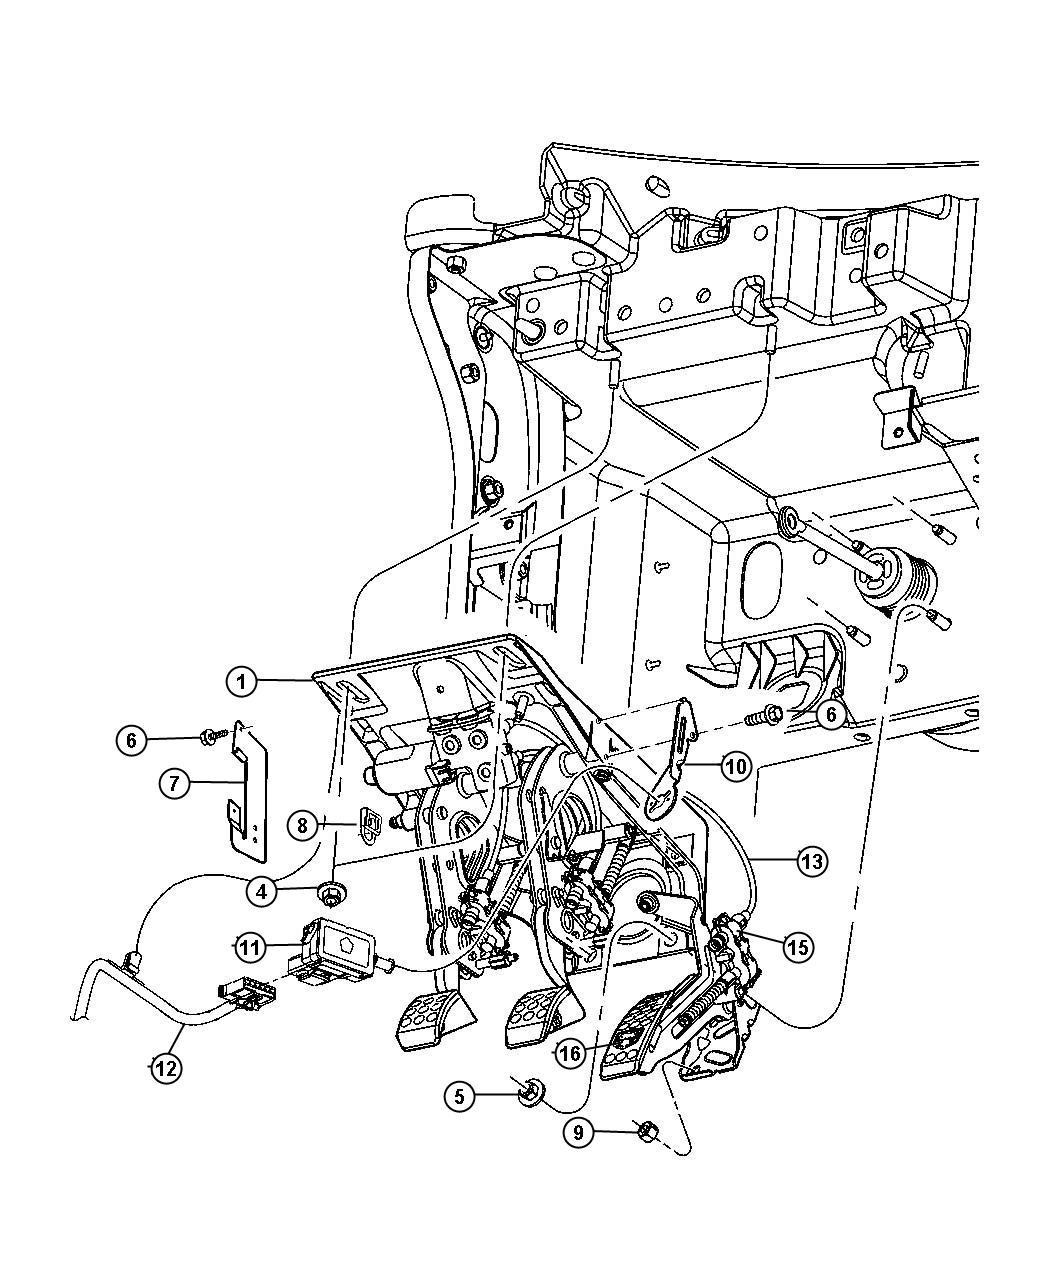 Dodge Viper Bracket Wiring Wiring Harness After 08 11